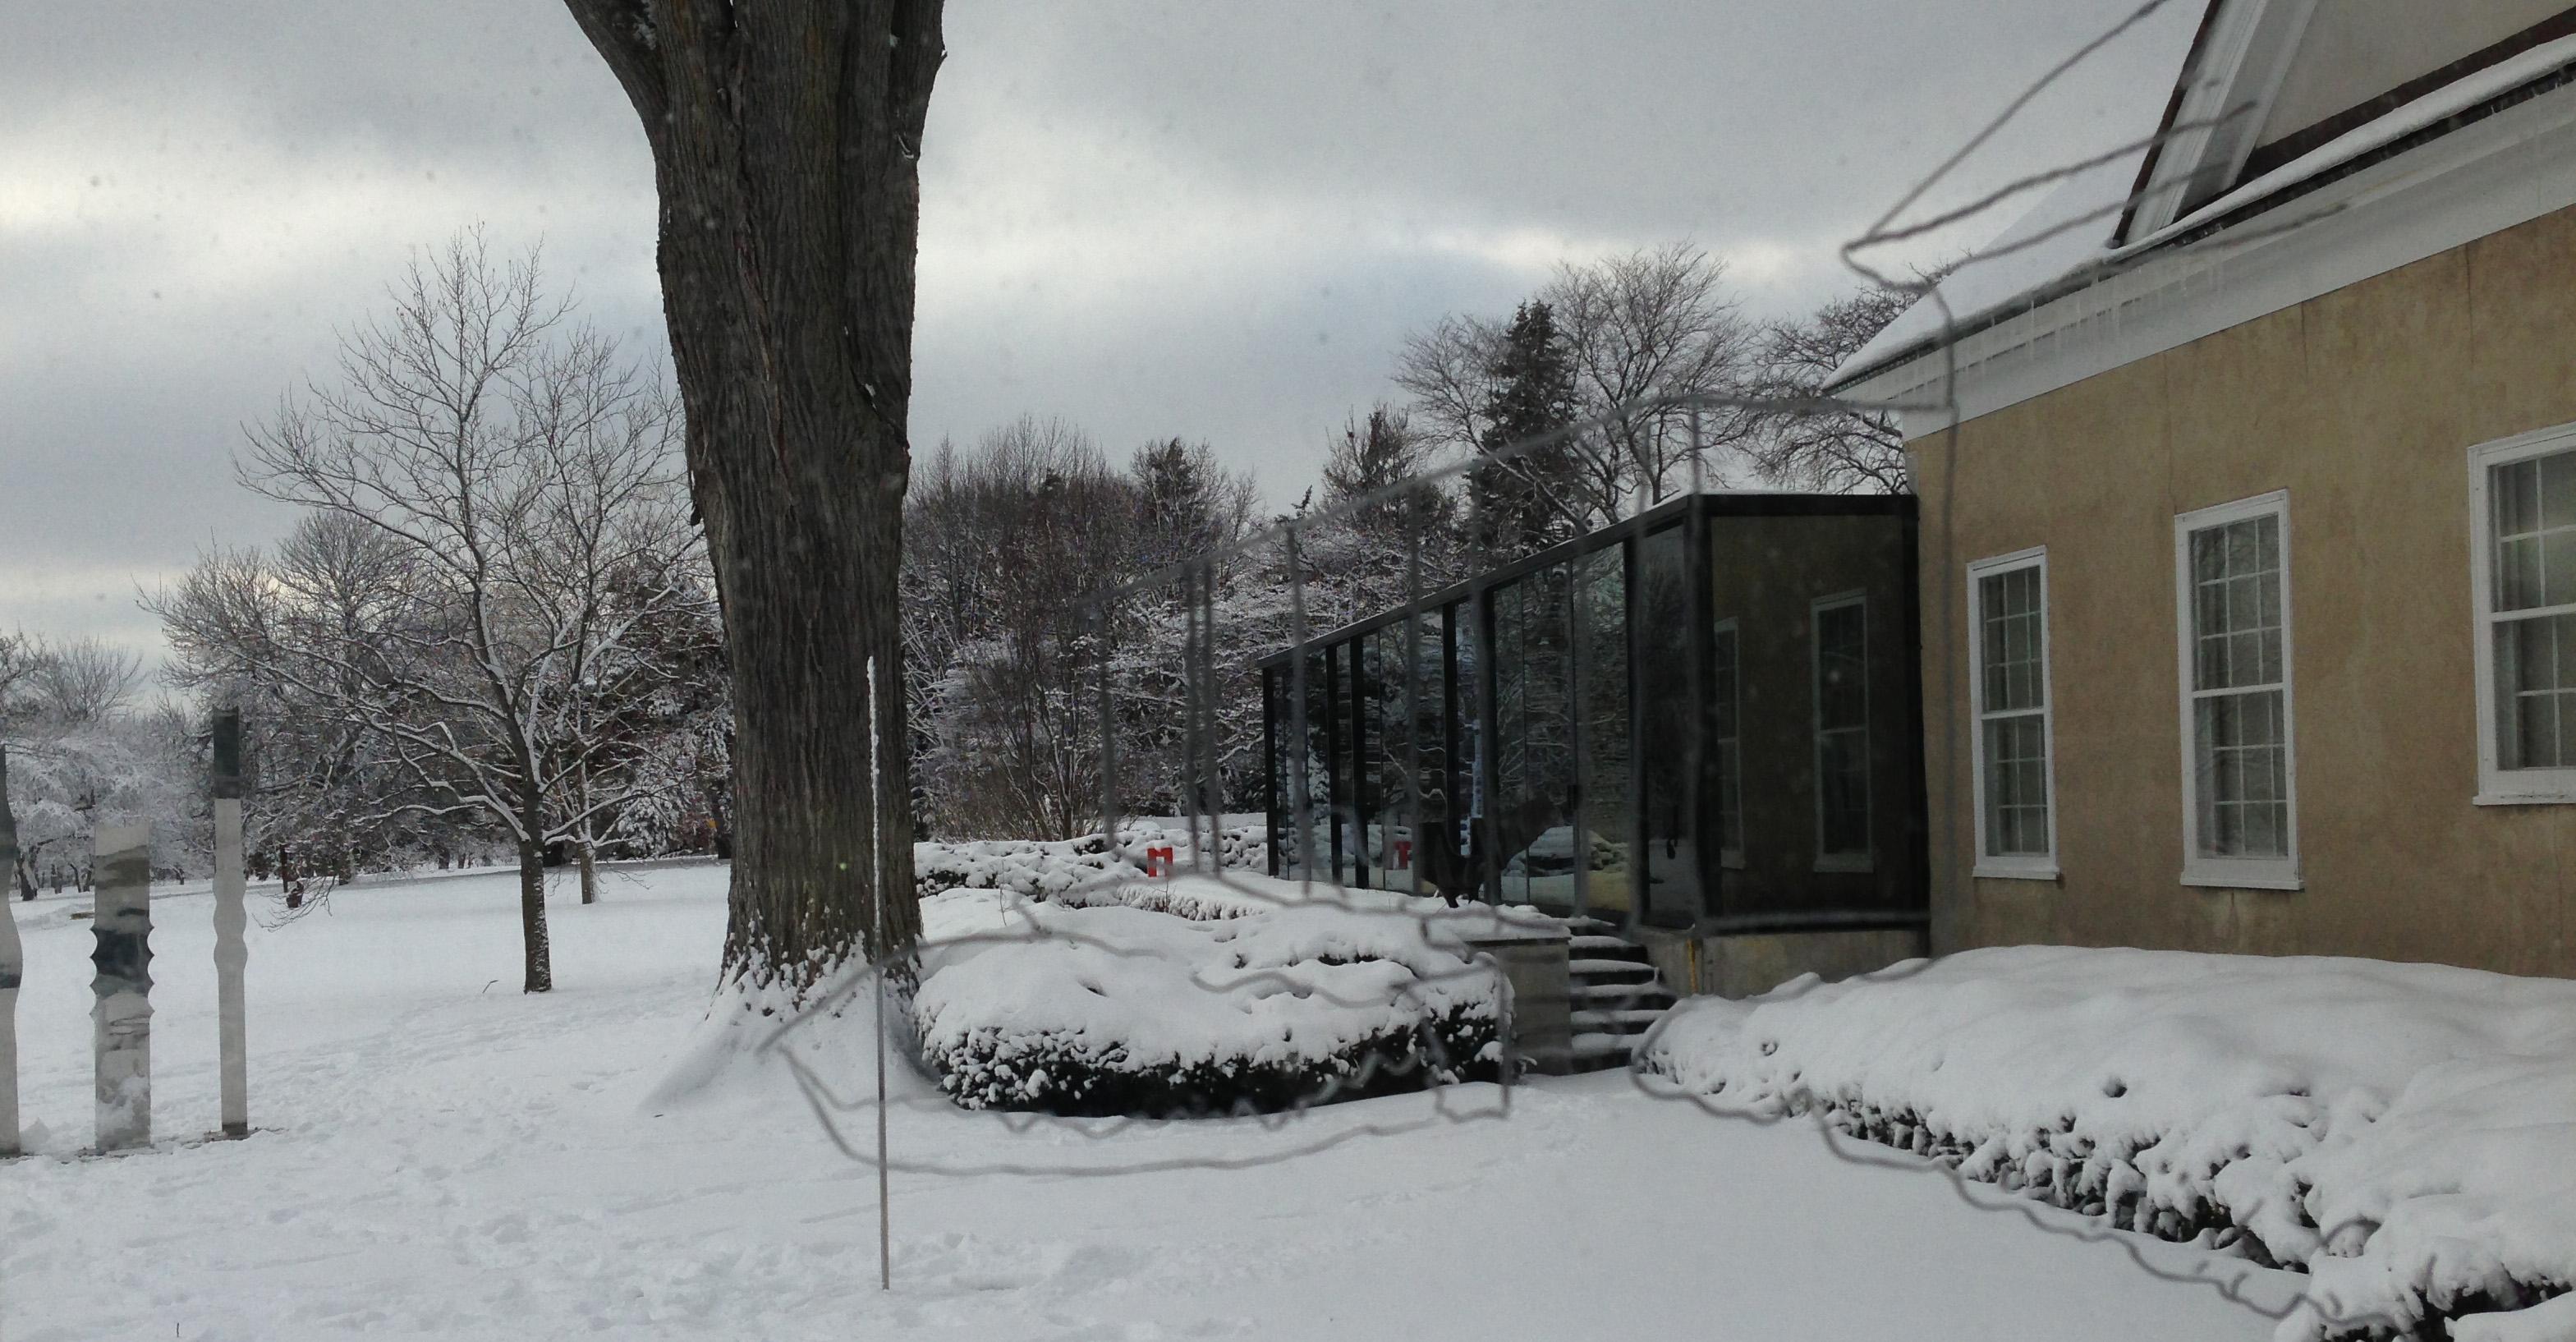 surfacing, glass house